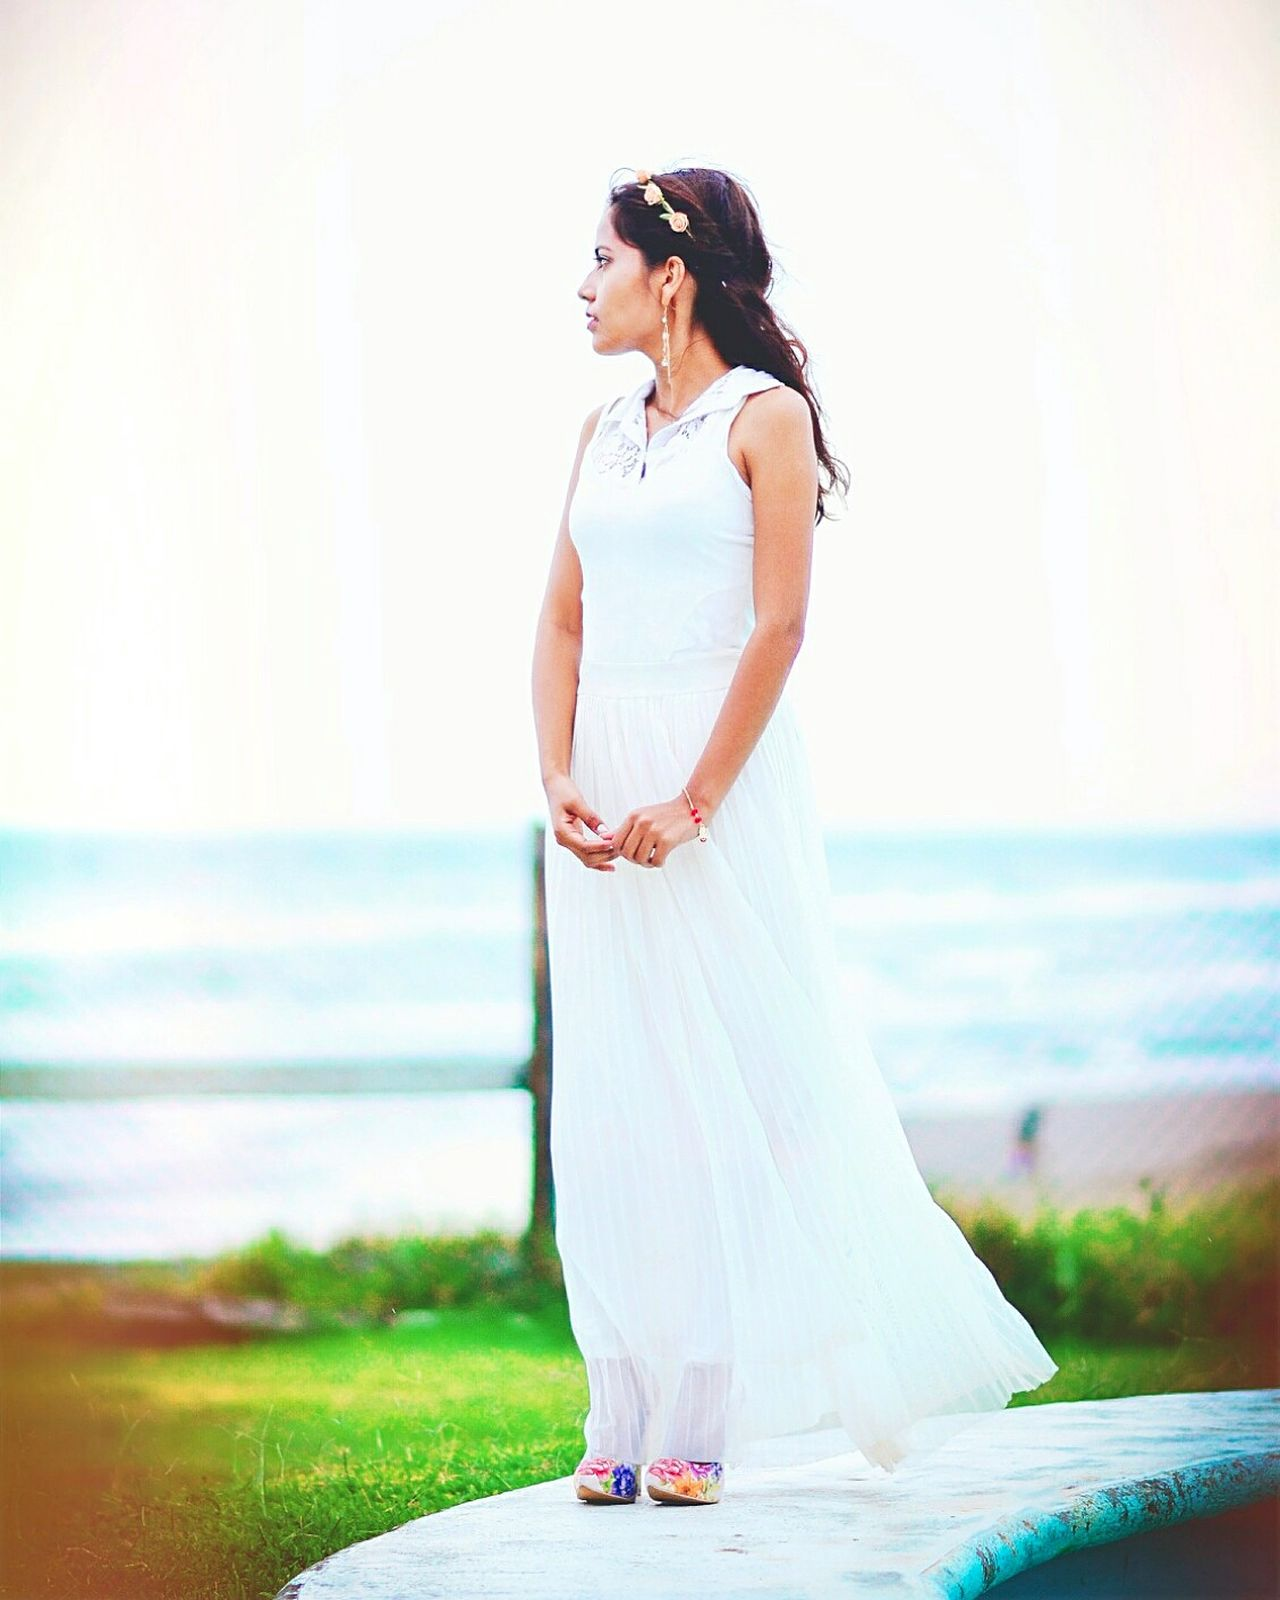 Beautiful stock photos of mexiko, wedding dress, bride, wedding, young adult